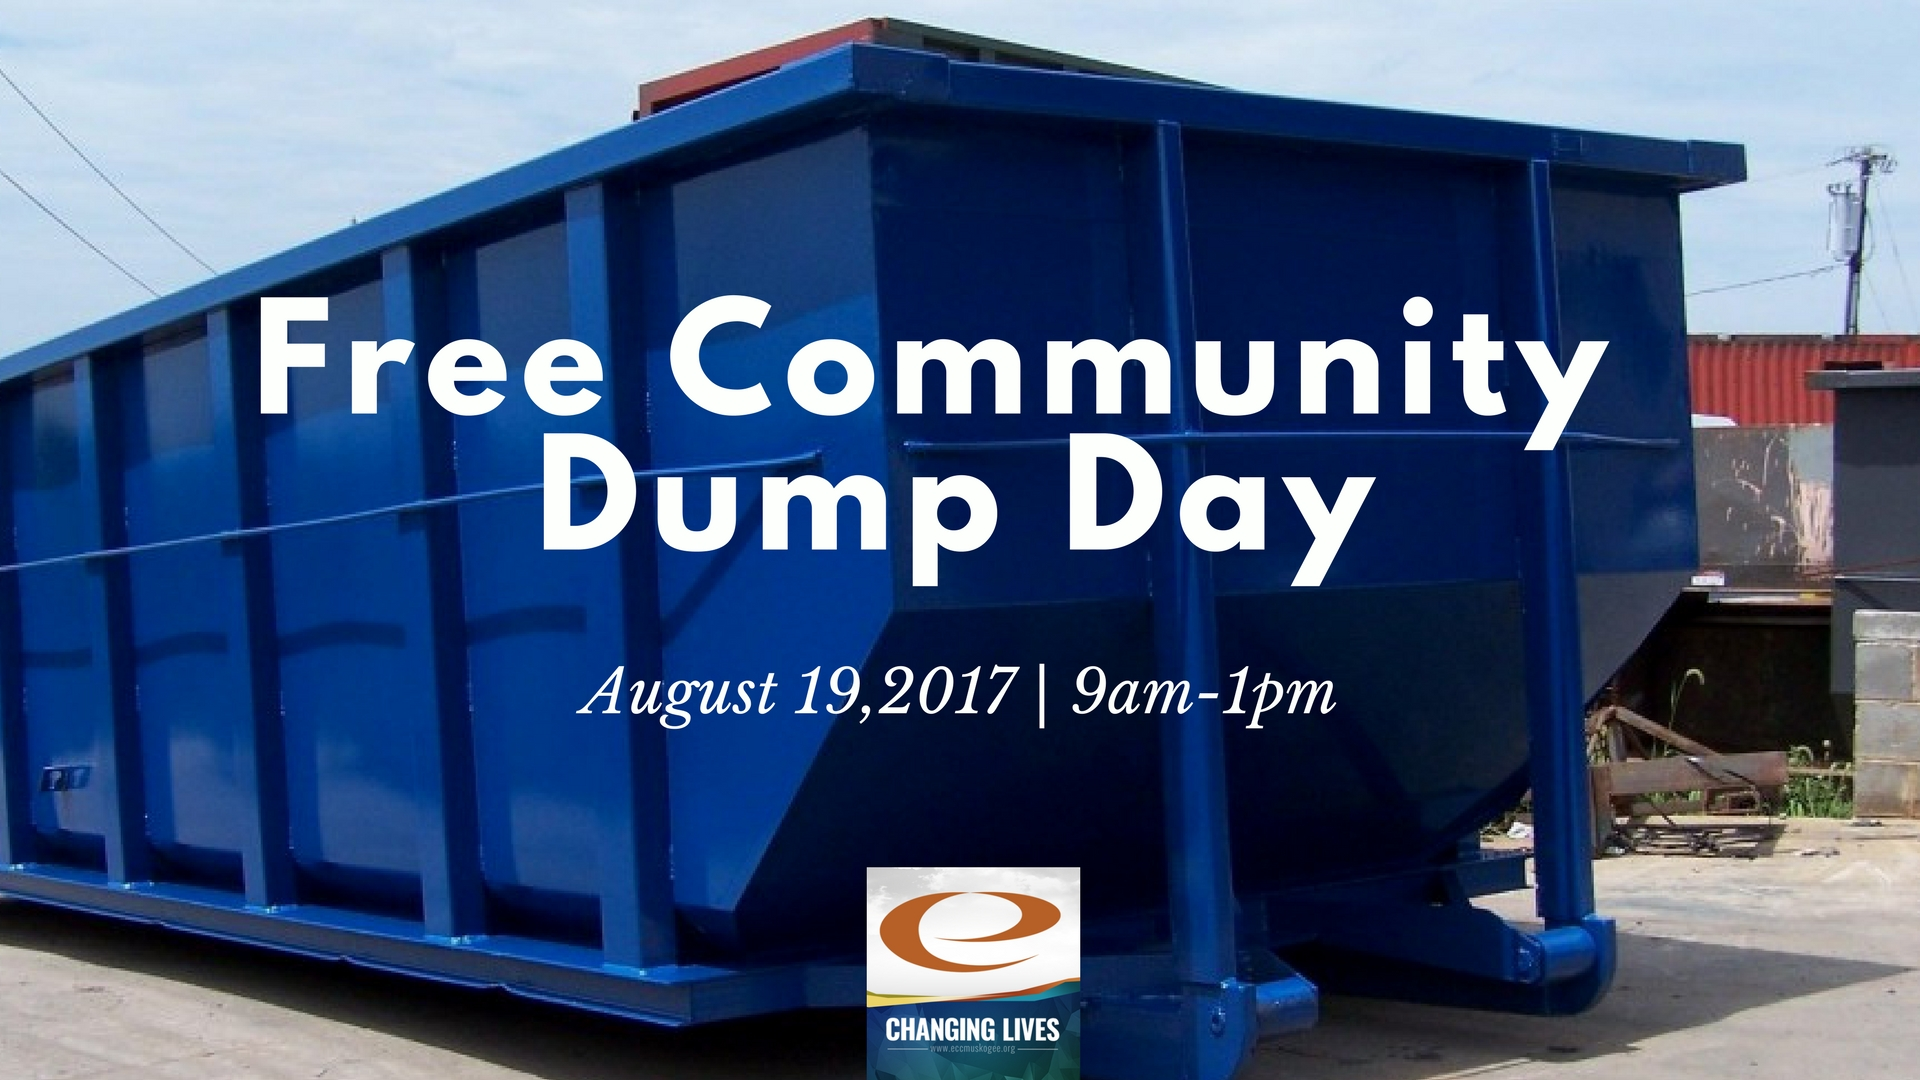 Community dump day 2017